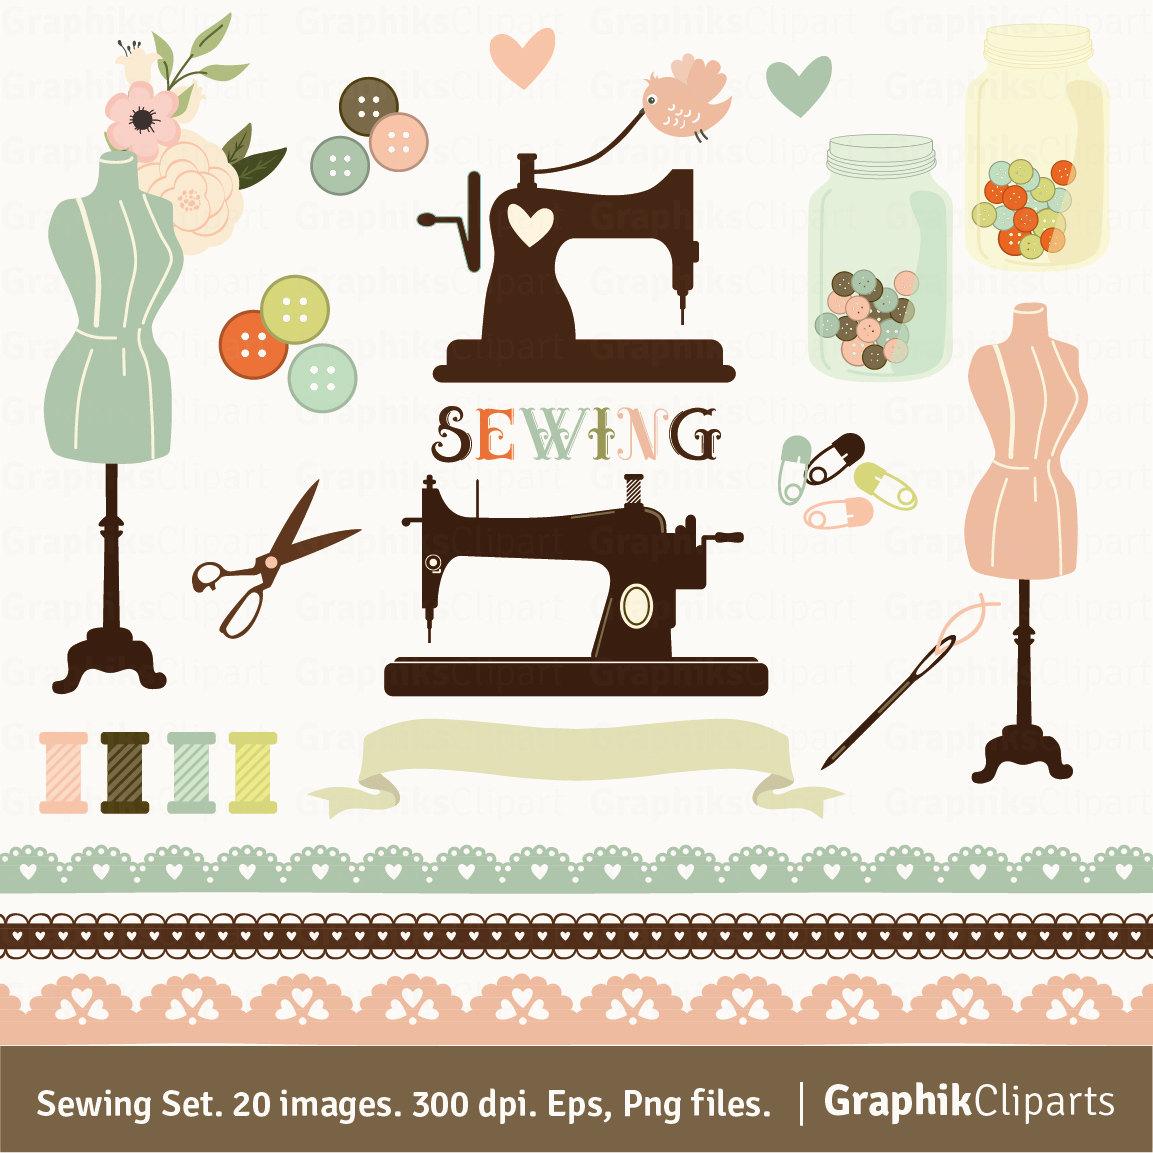 Sewing Machine clipart craft #15